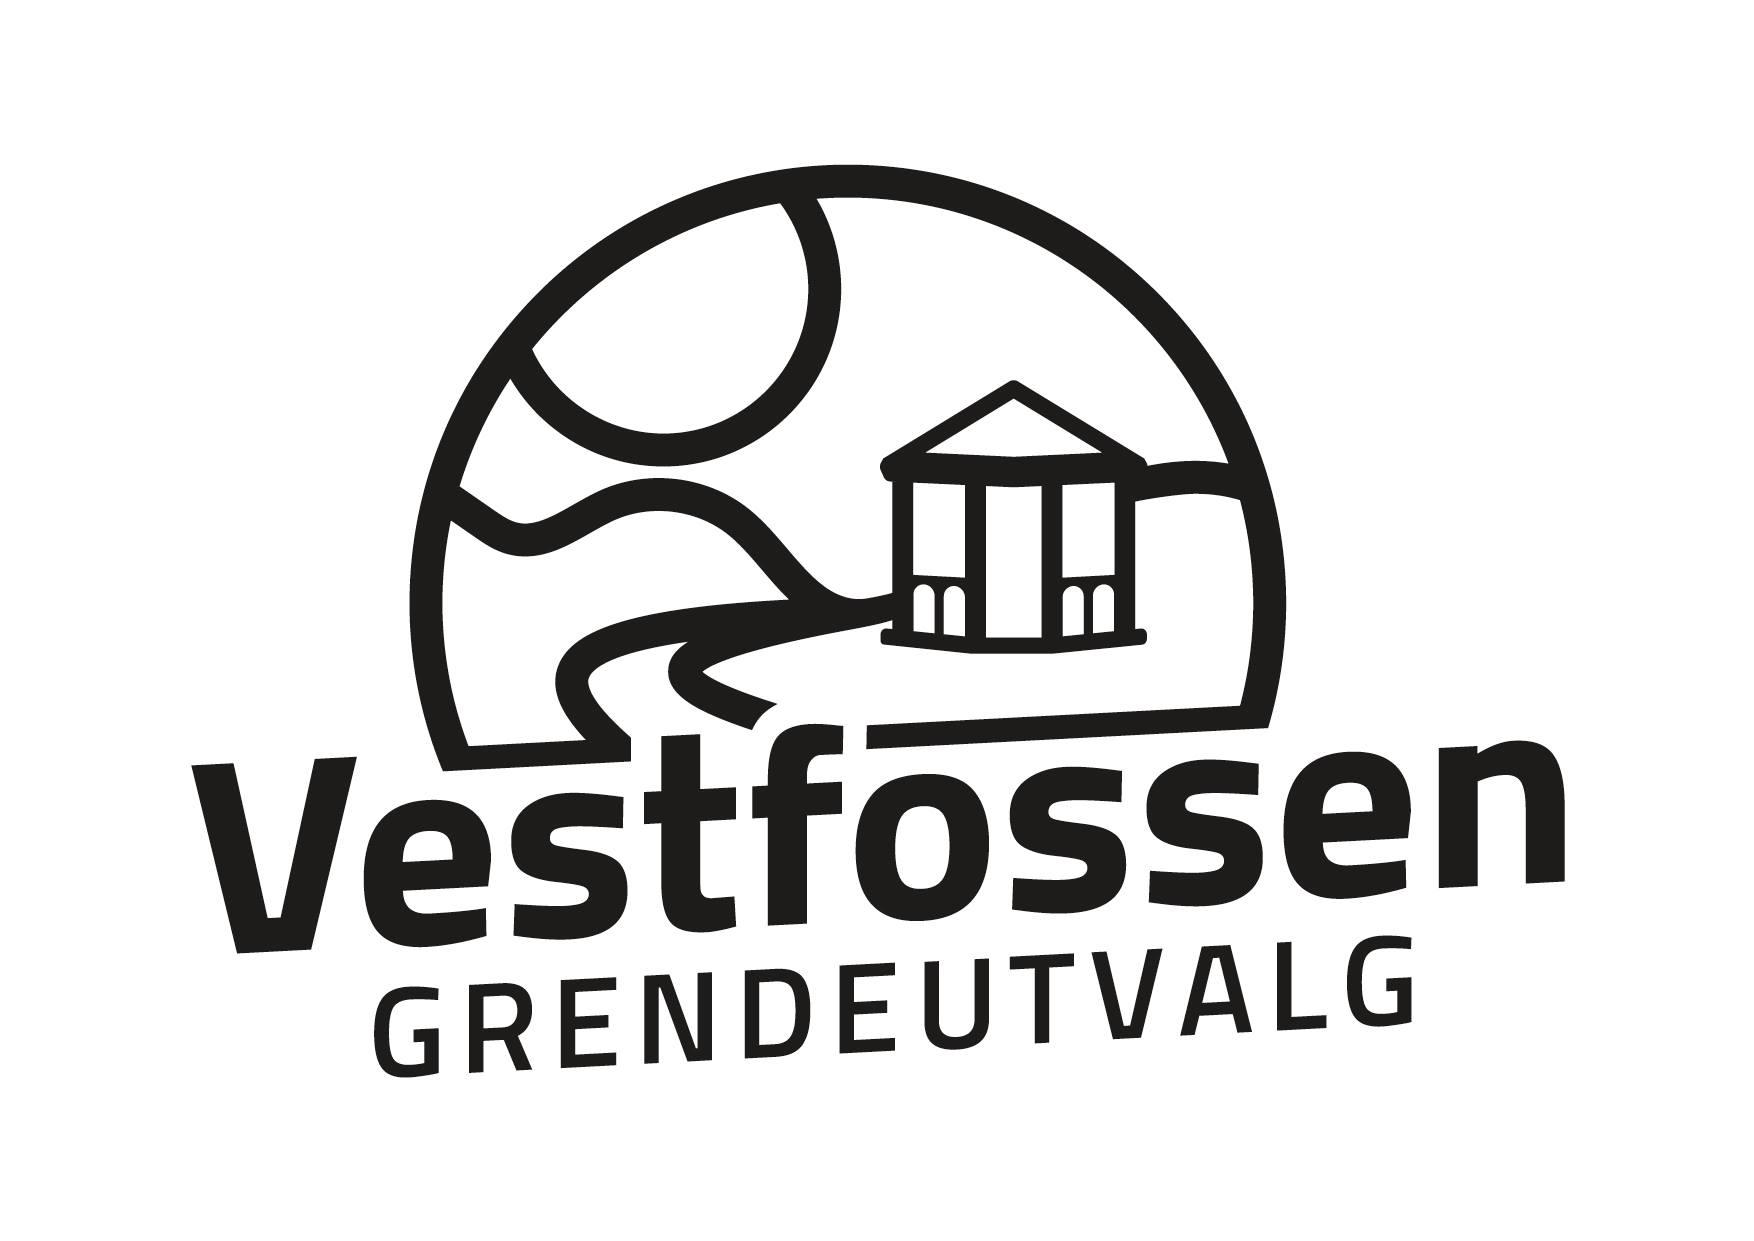 Vestfossen Grendeutvalg lydguide audioguide reiseguide turistguide historieguide Voice Of Norway